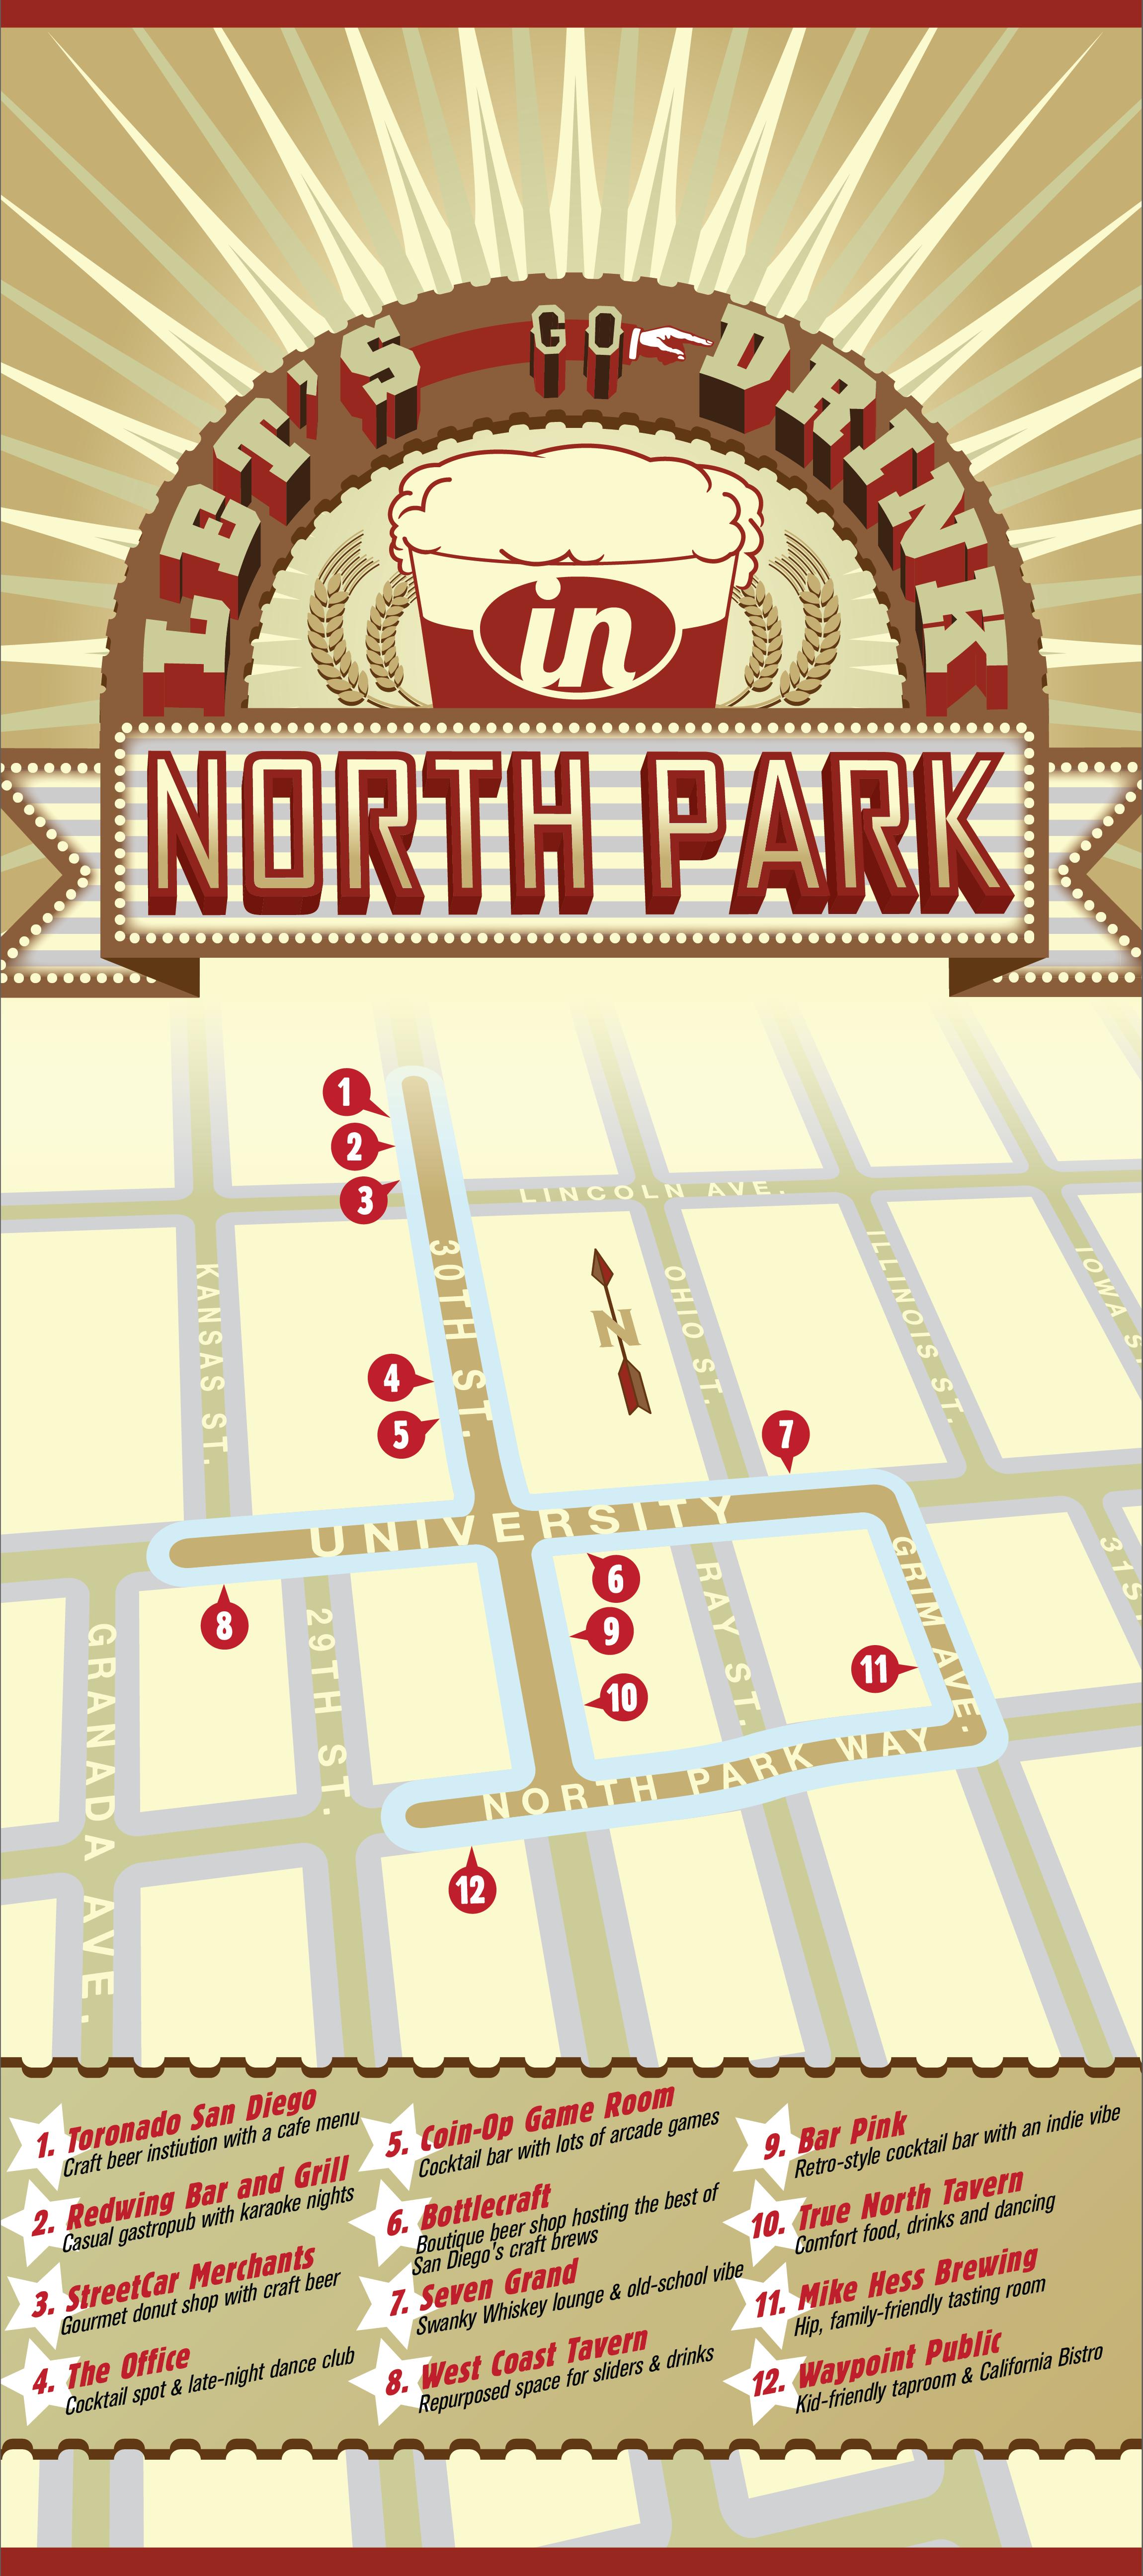 MAP_NORTH_PARK_PUBS-01.png